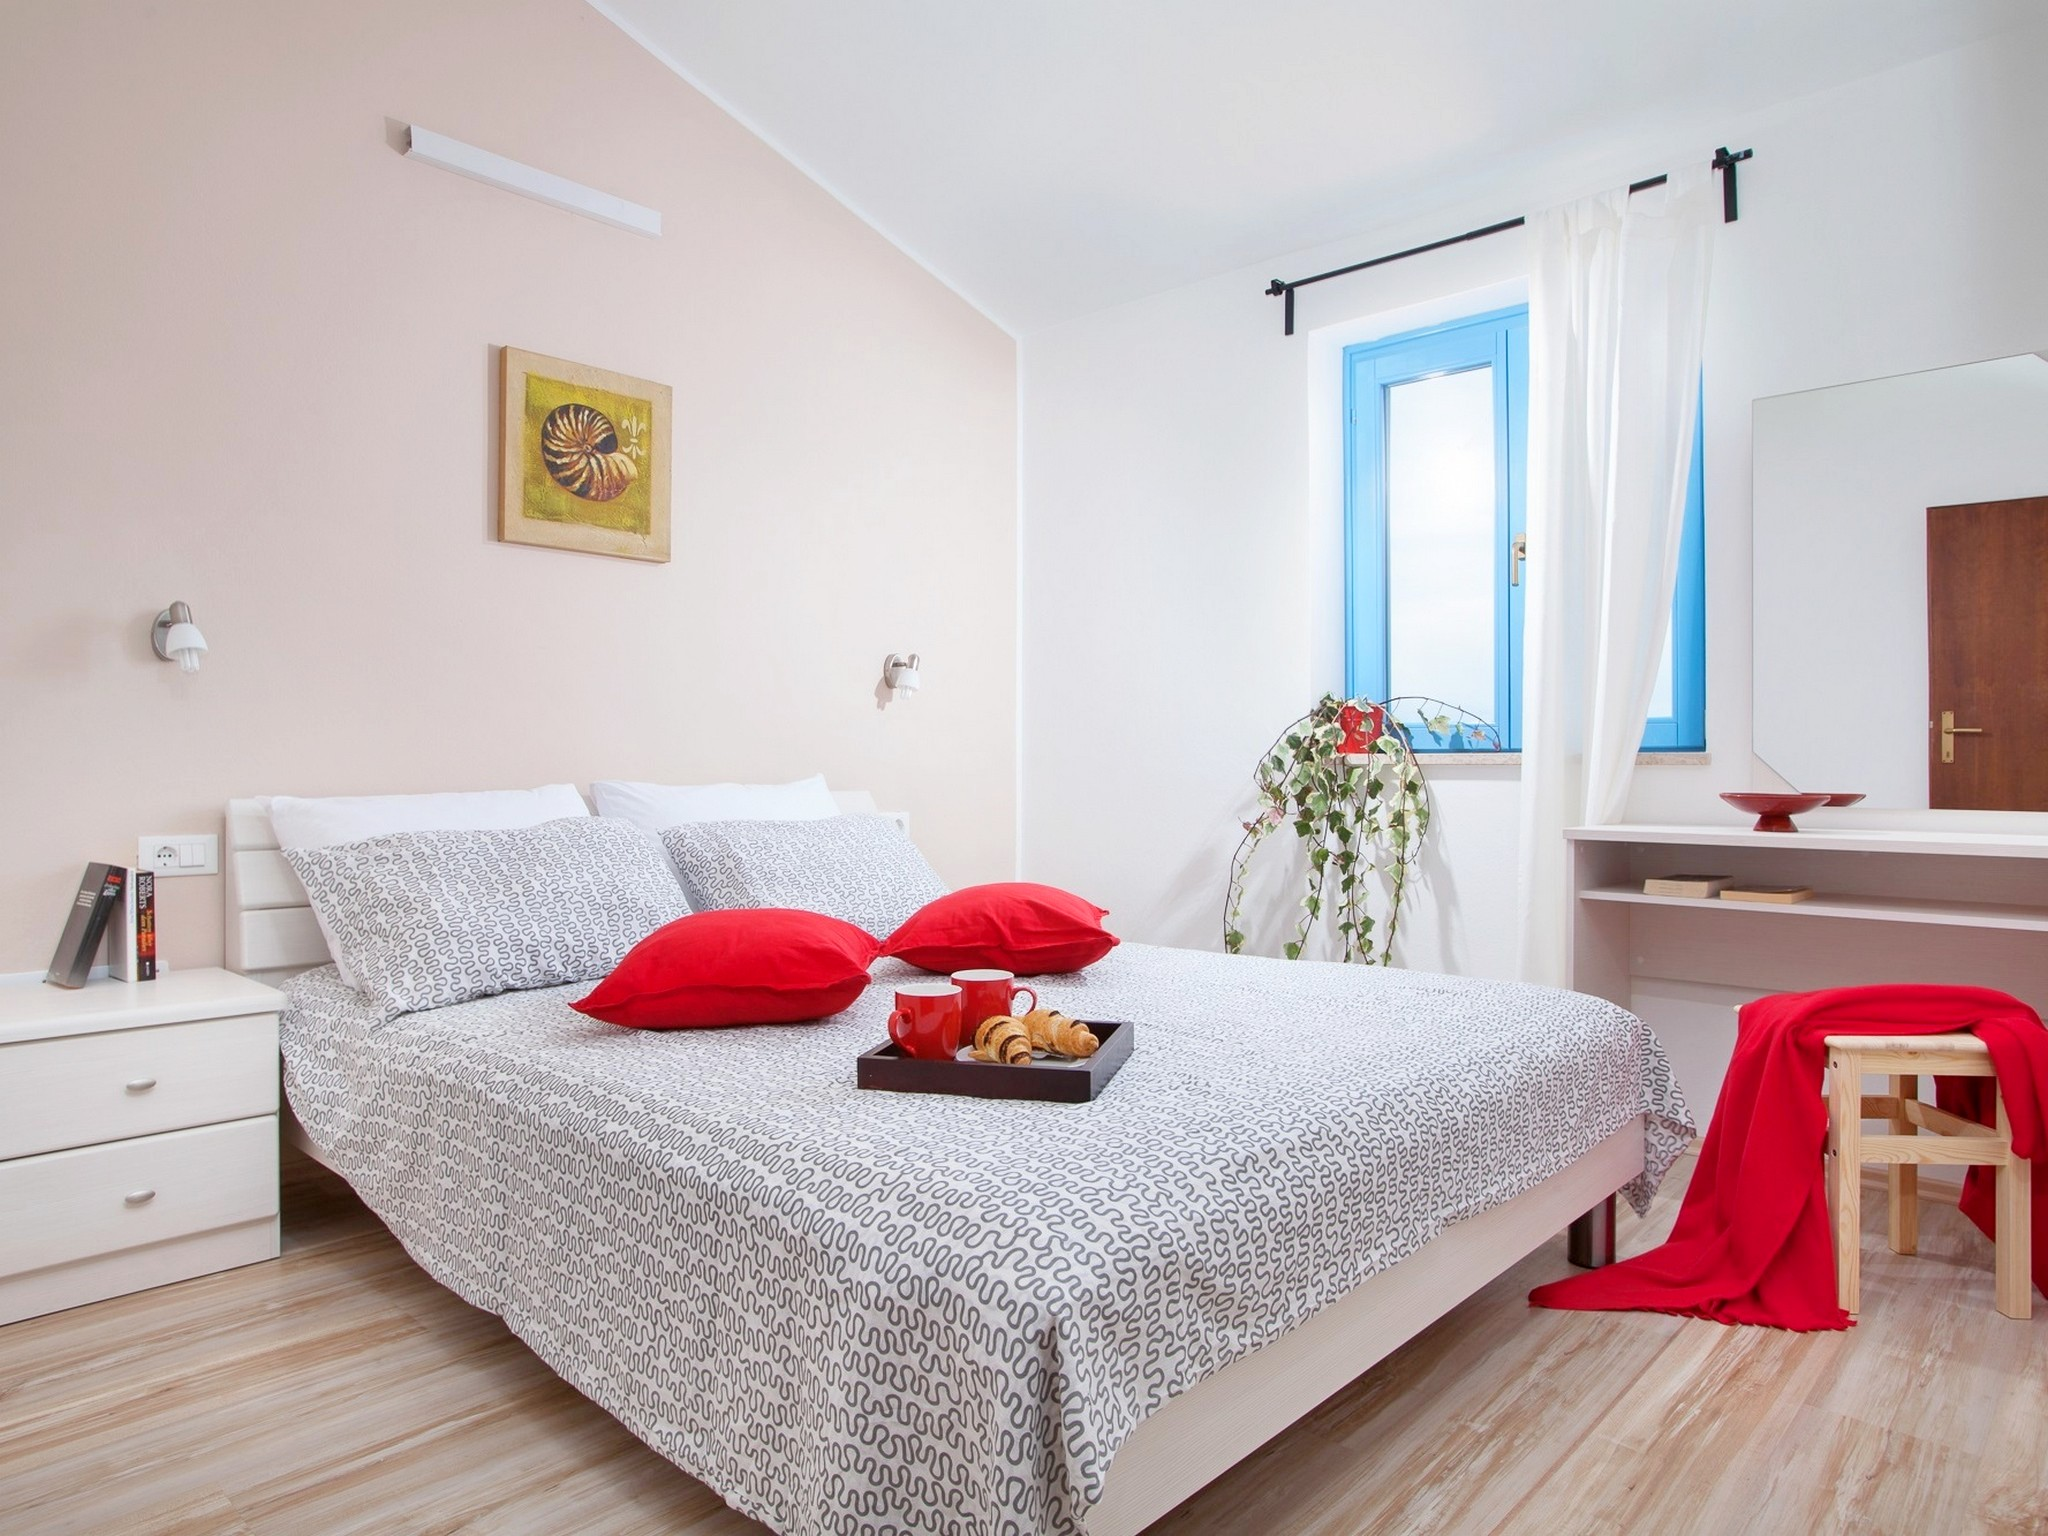 Ferienhaus Bruno, Kua za odmor s bazenom (2204668), Mugeba, , Istrien, Kroatien, Bild 10